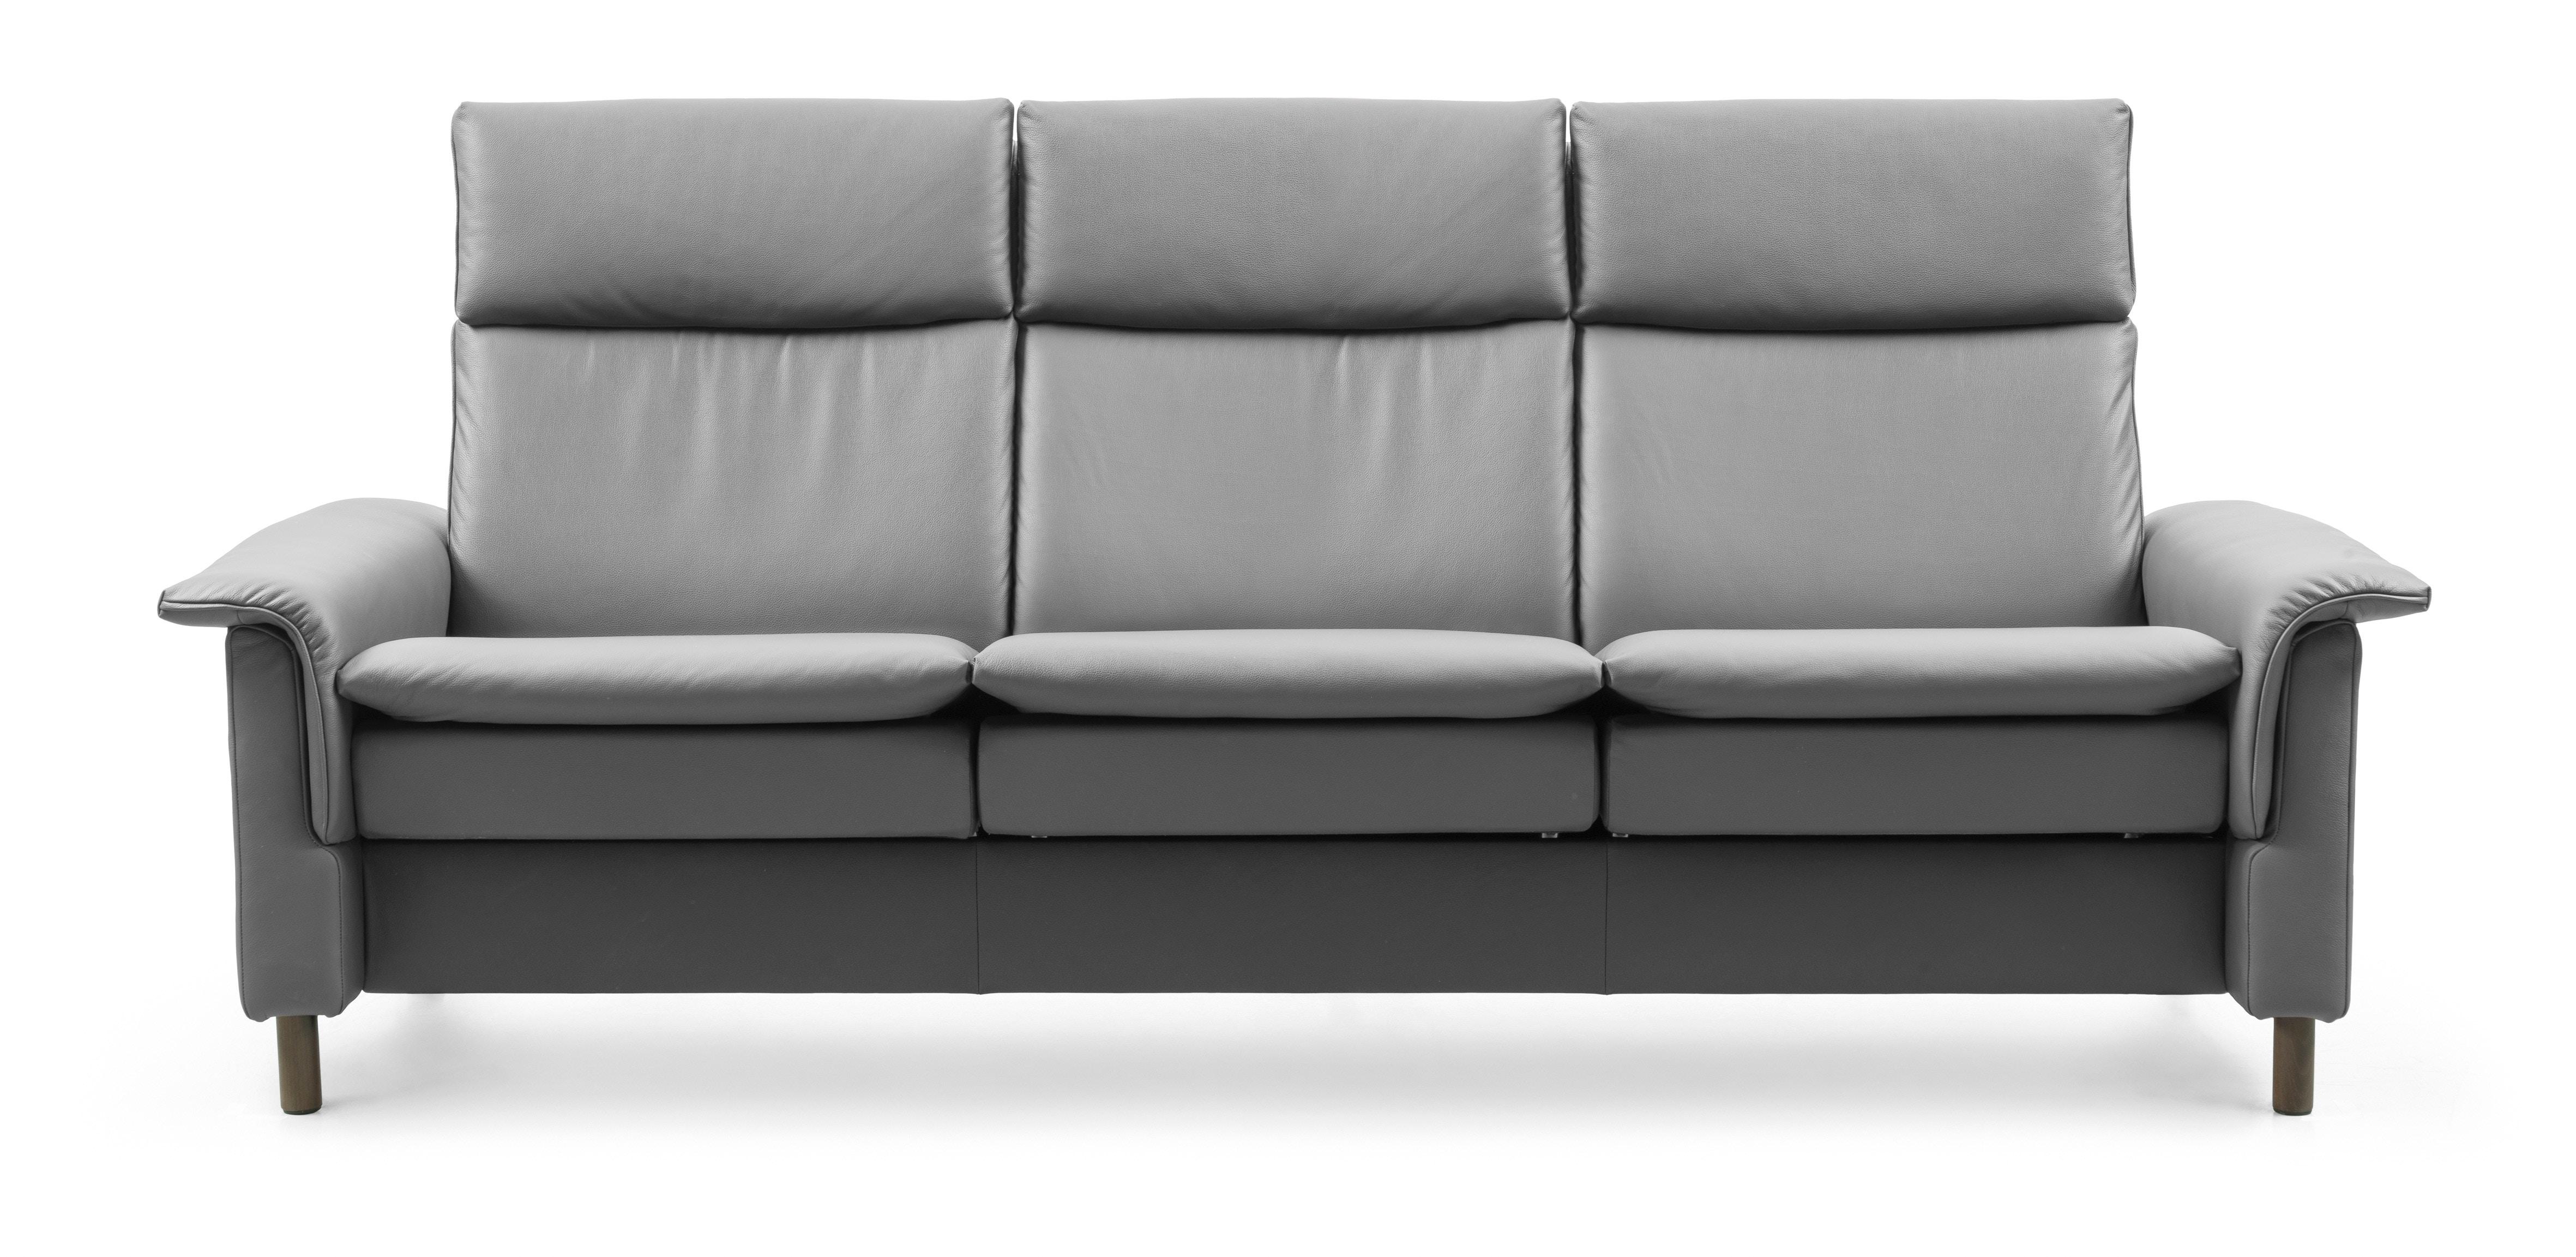 Stressless By Ekornes Stressless® Aurora Sofa High Back 1444030